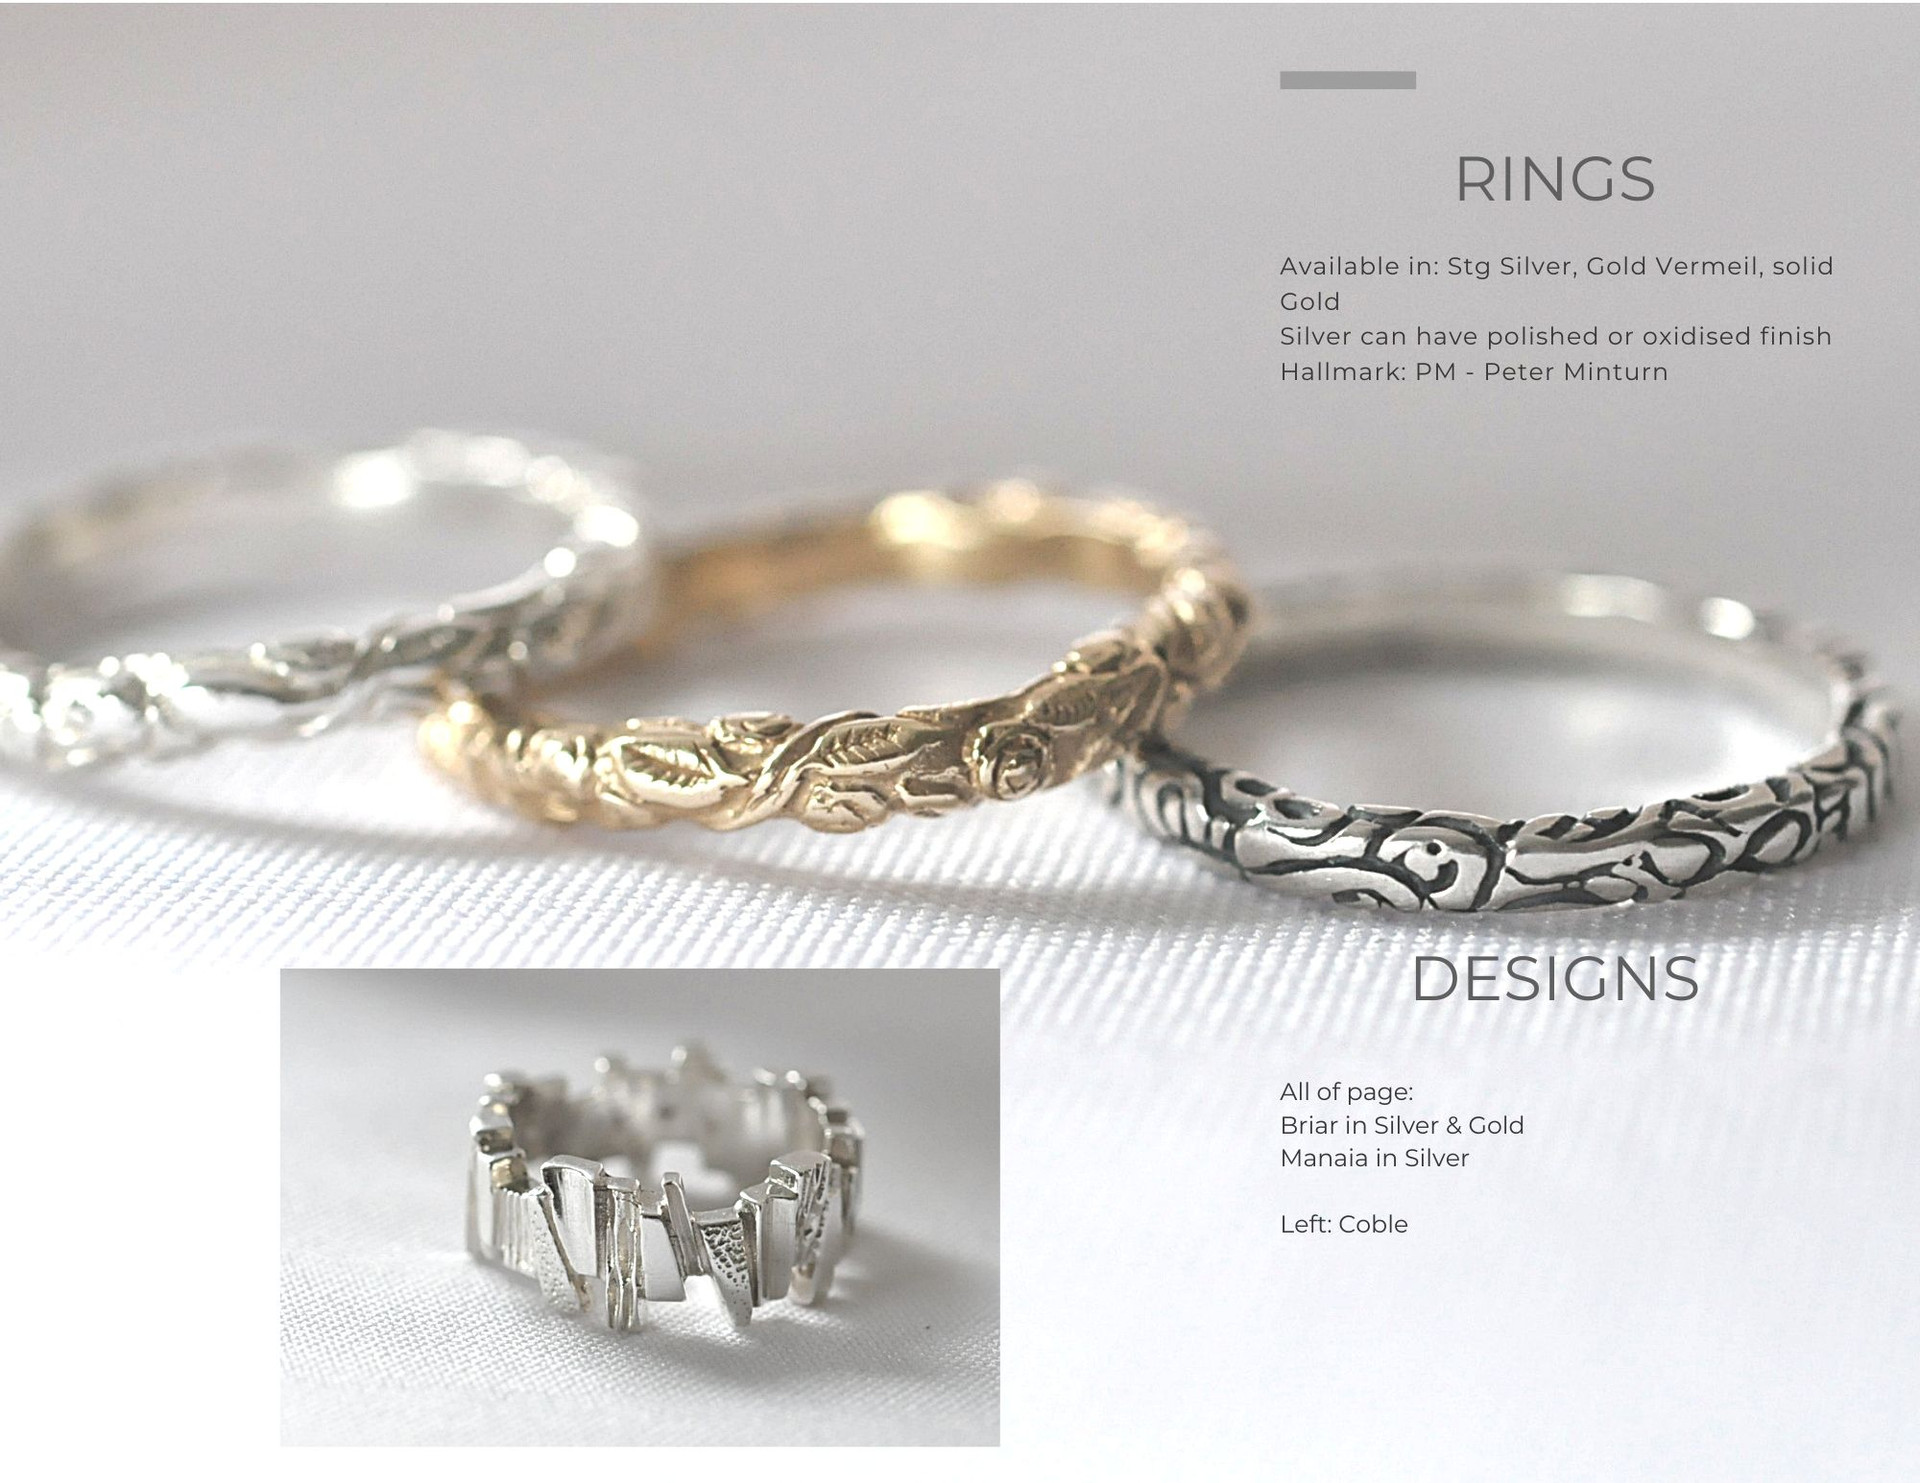 Briar & Coble Band Rings